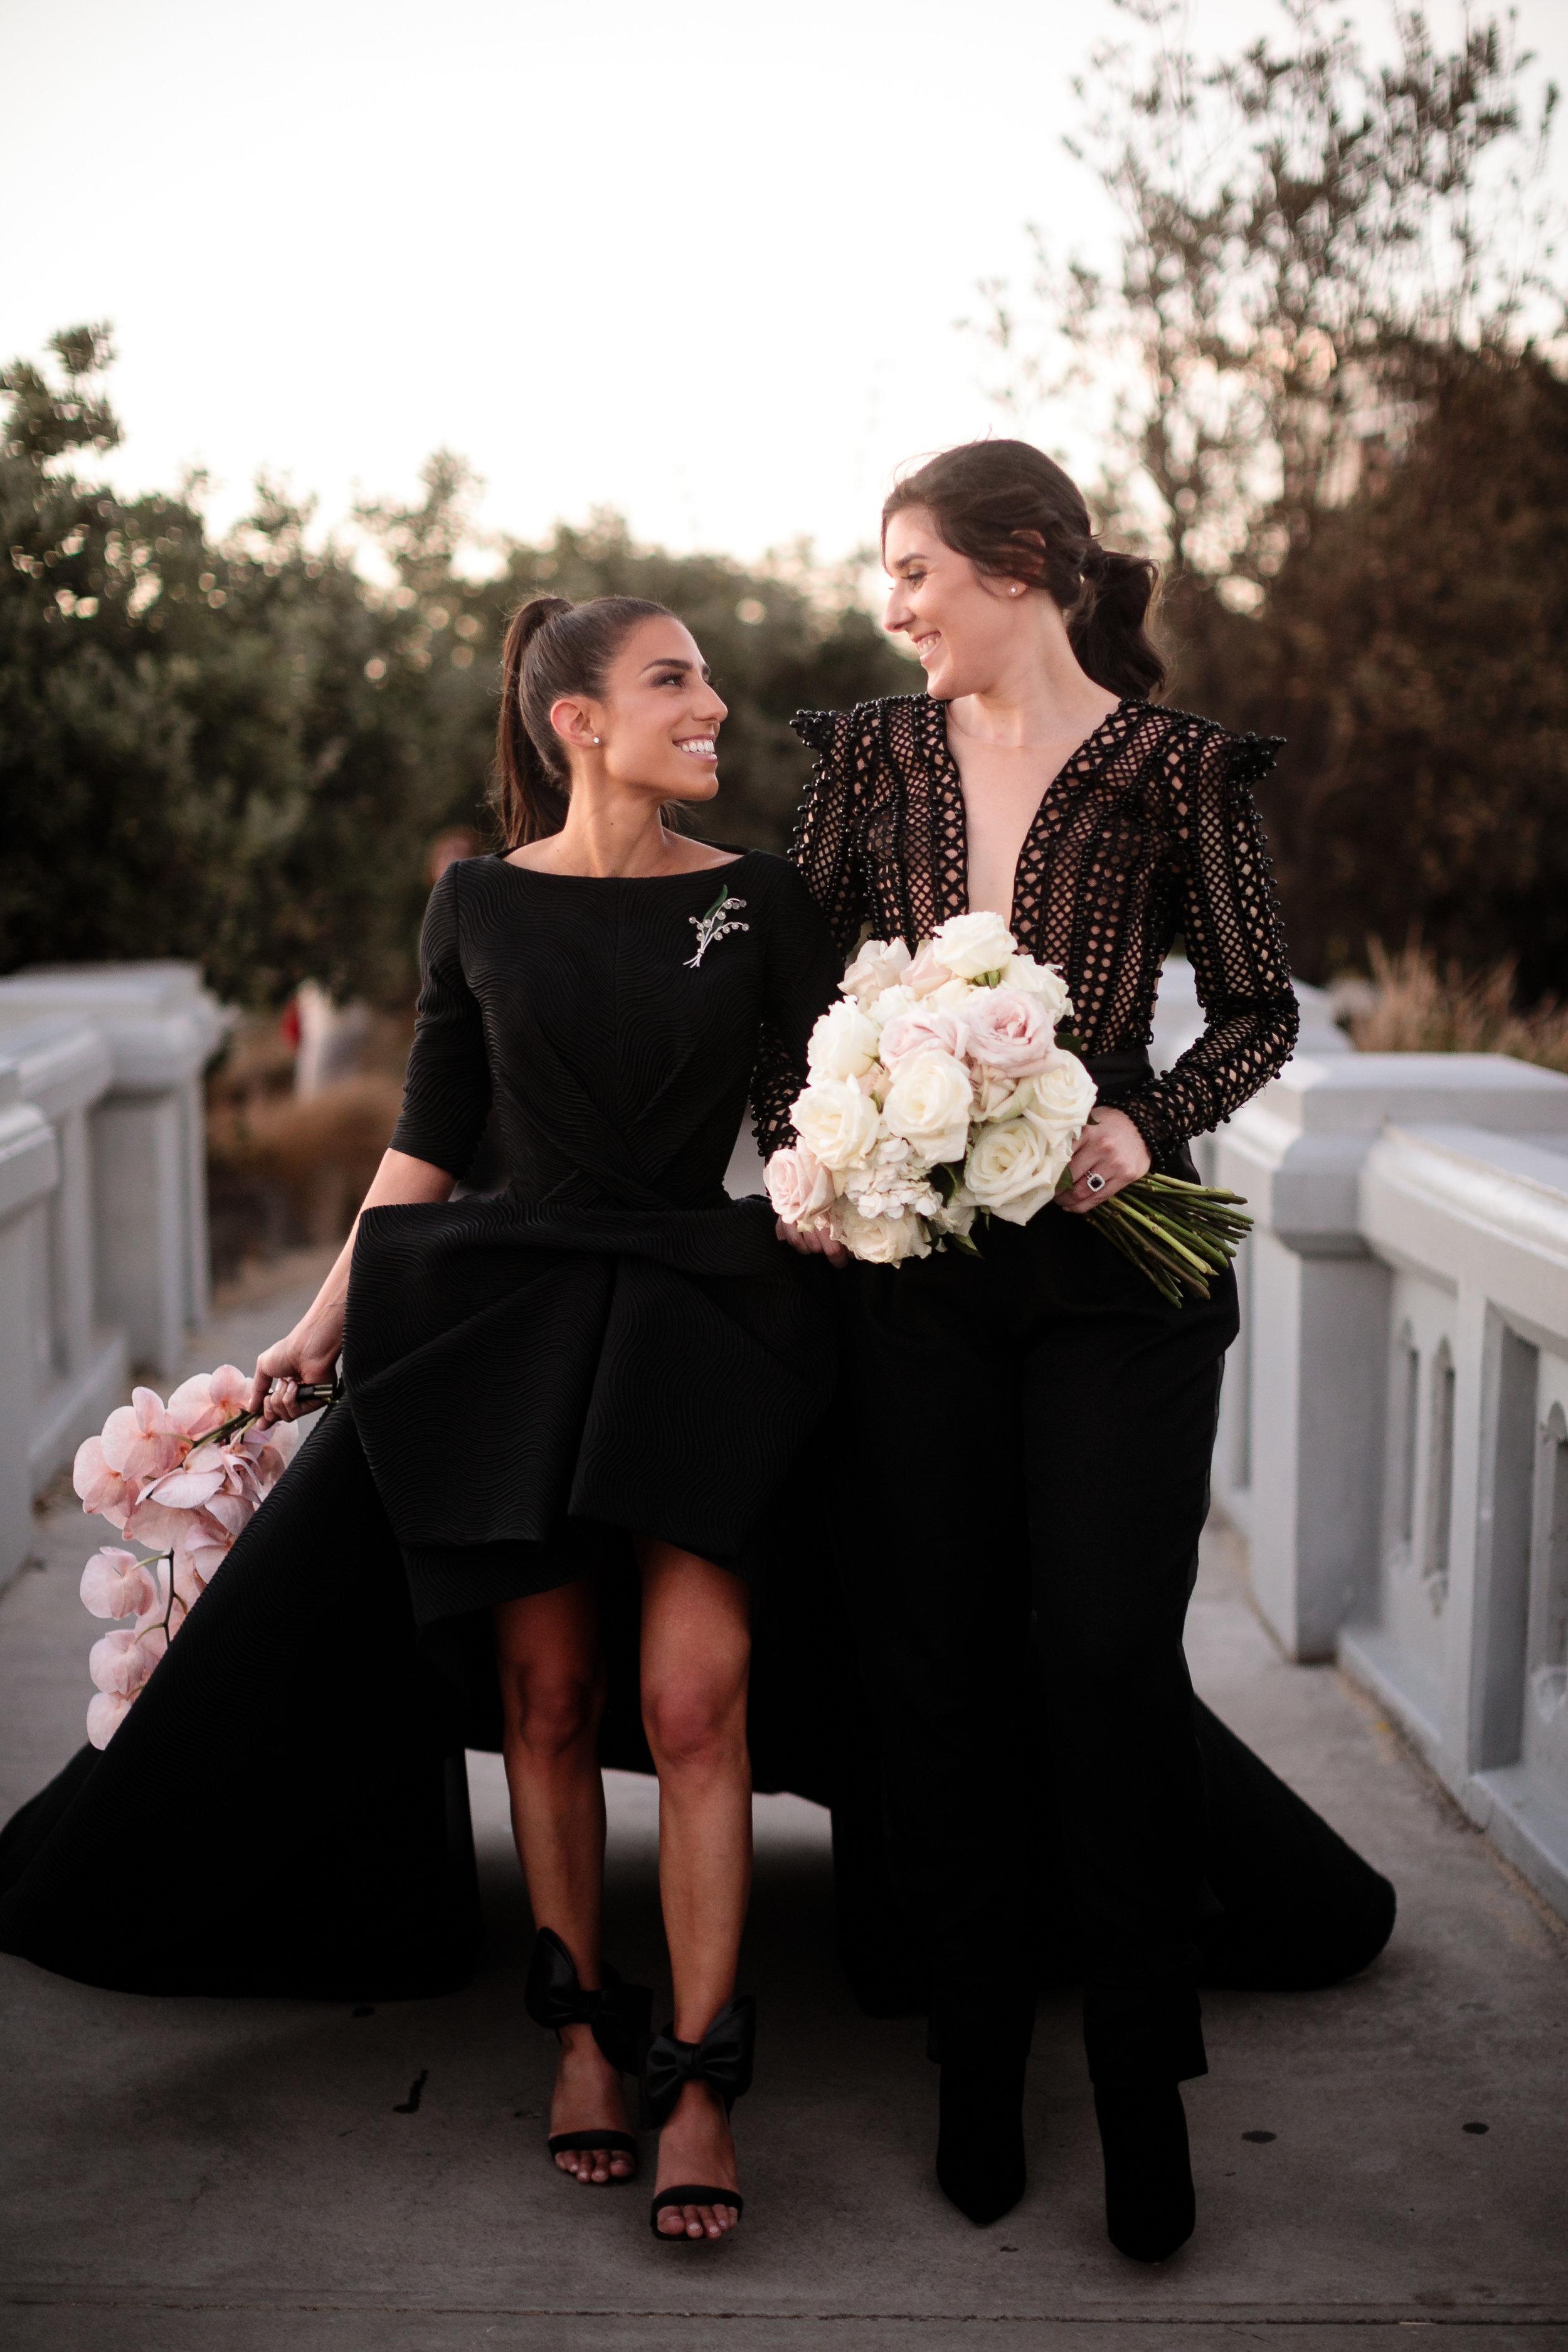 Antoinette&ChloeWedding_Highlights-22.jpg